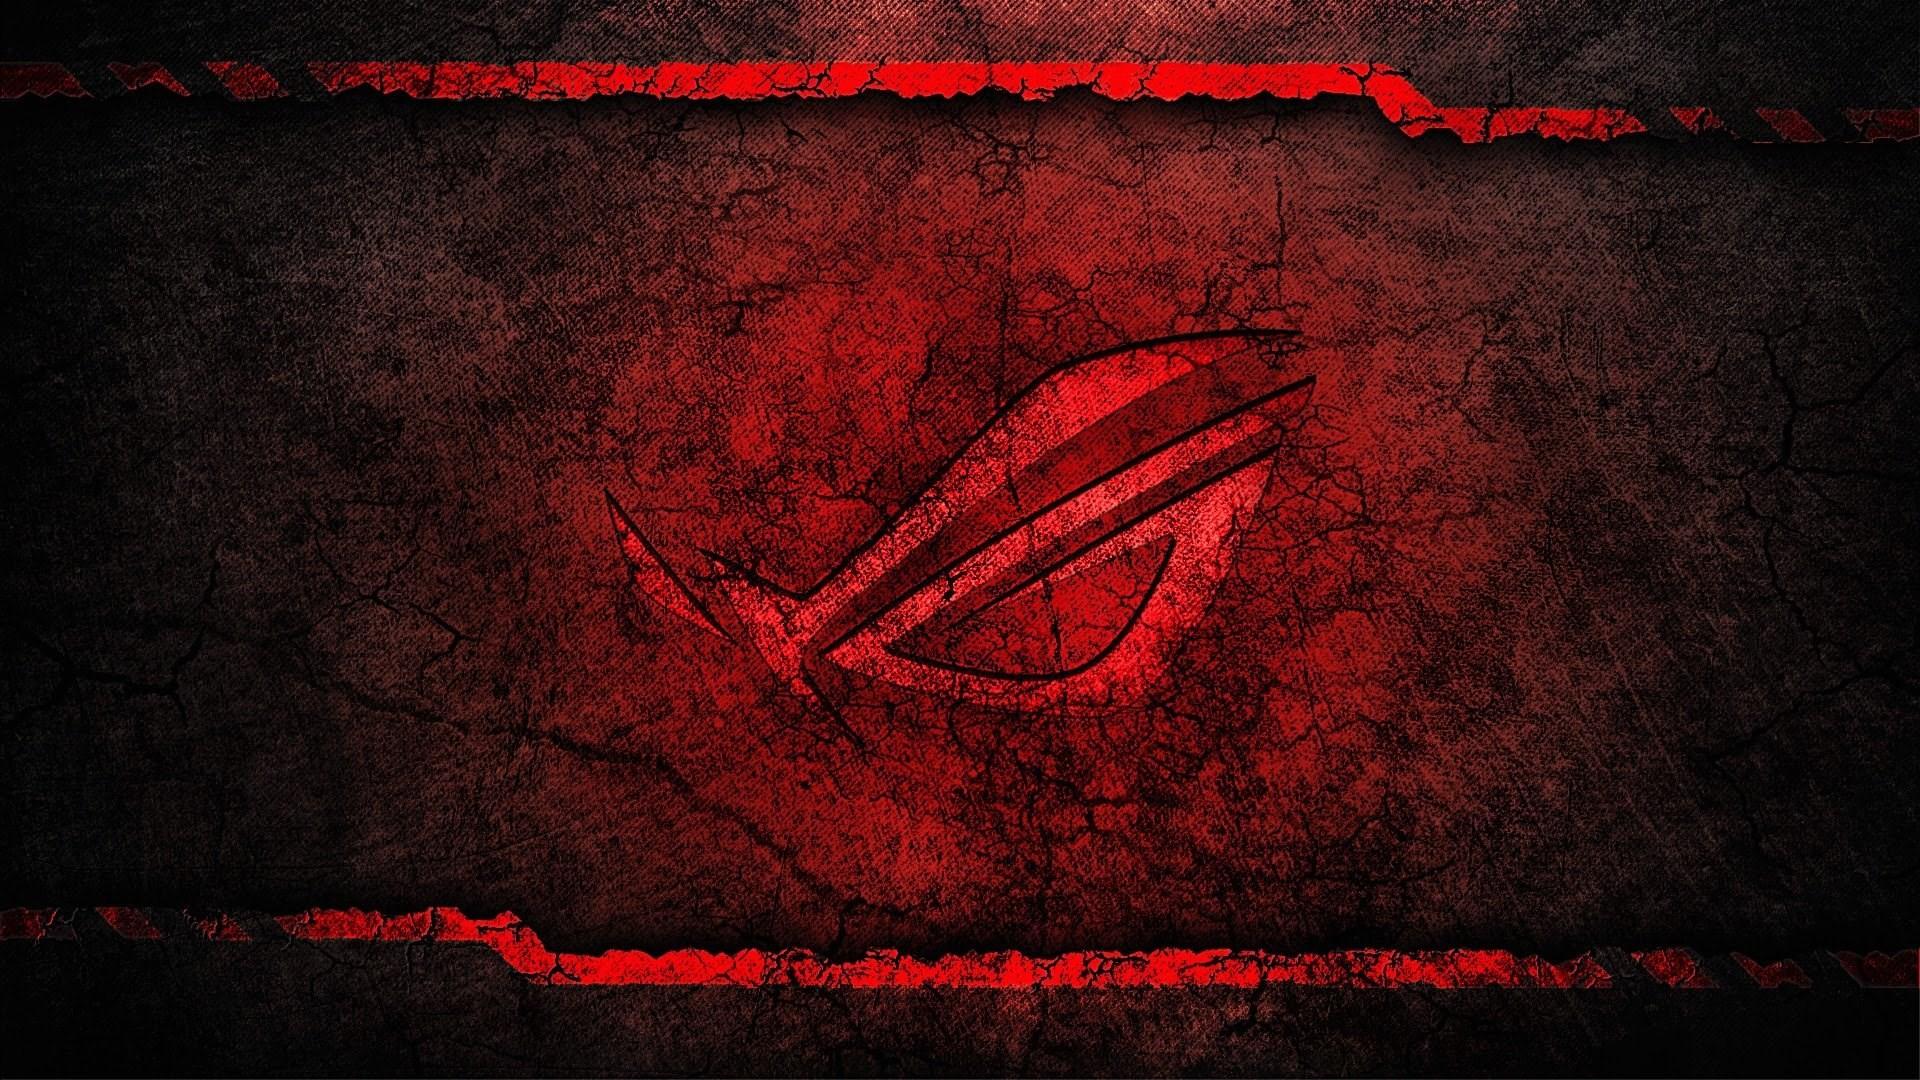 asus rog republic of gamers logo grunge background hd wallpaper